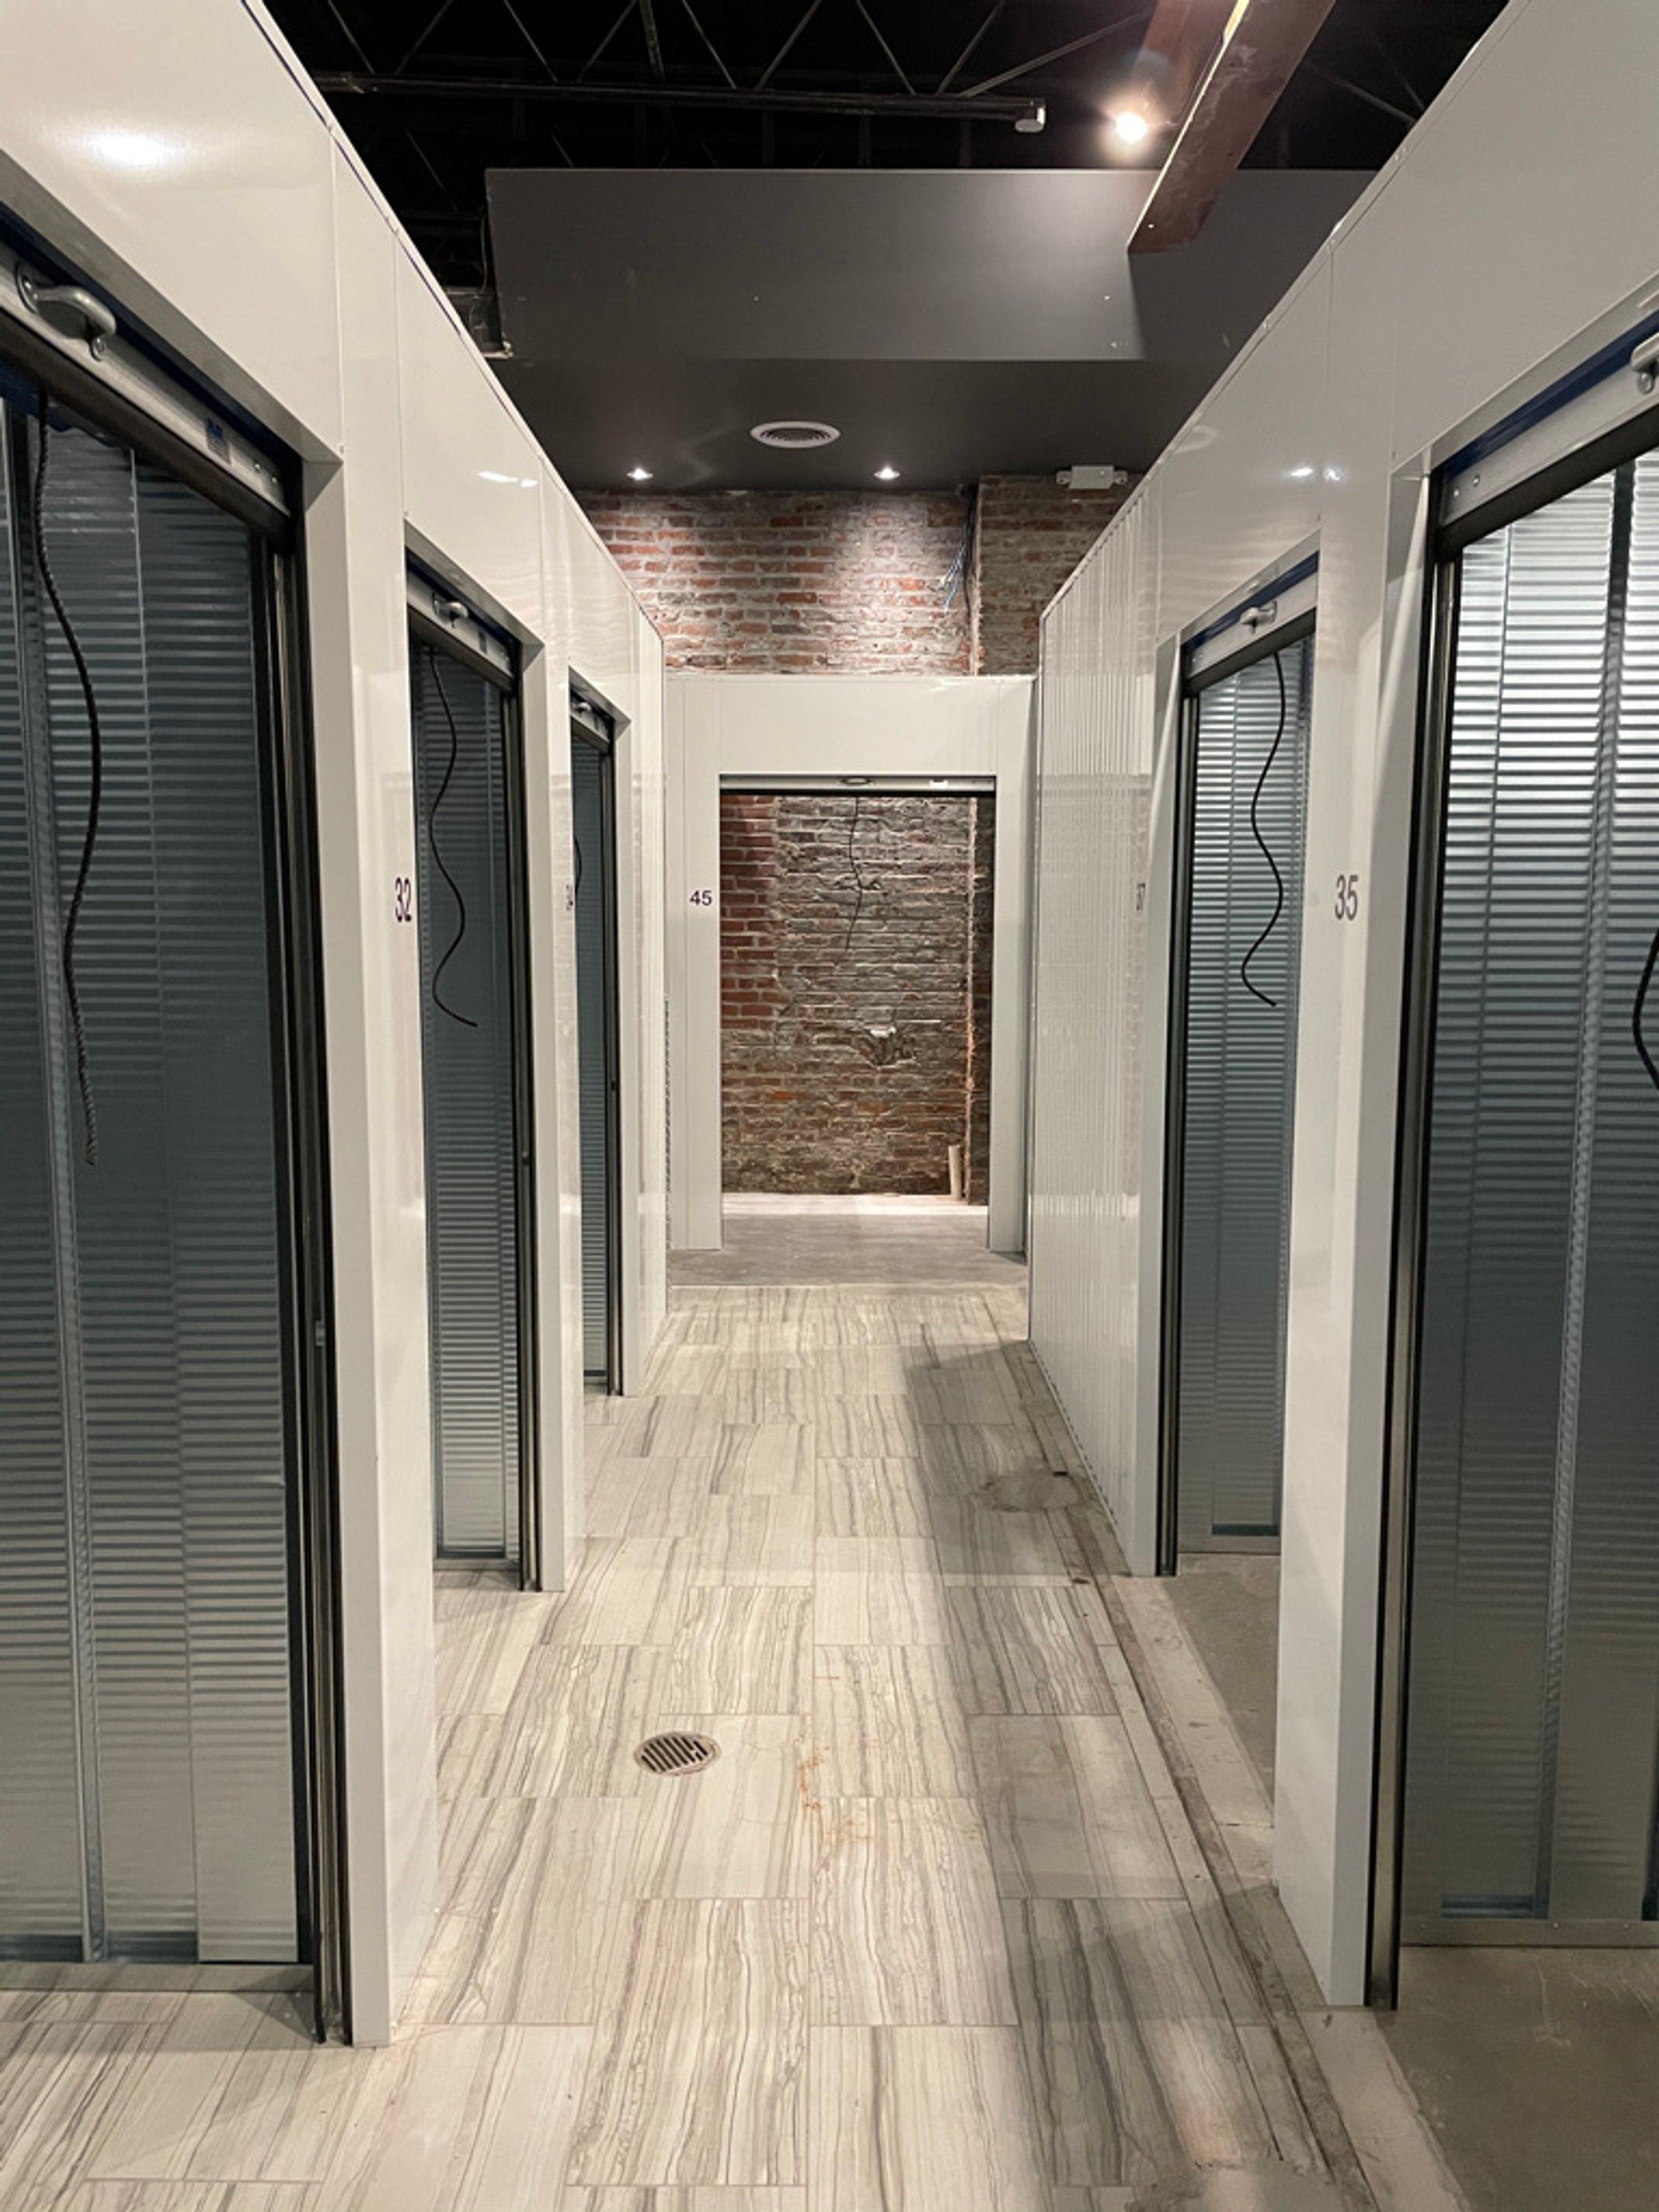 4x5 Self Storage Unit self storage unit